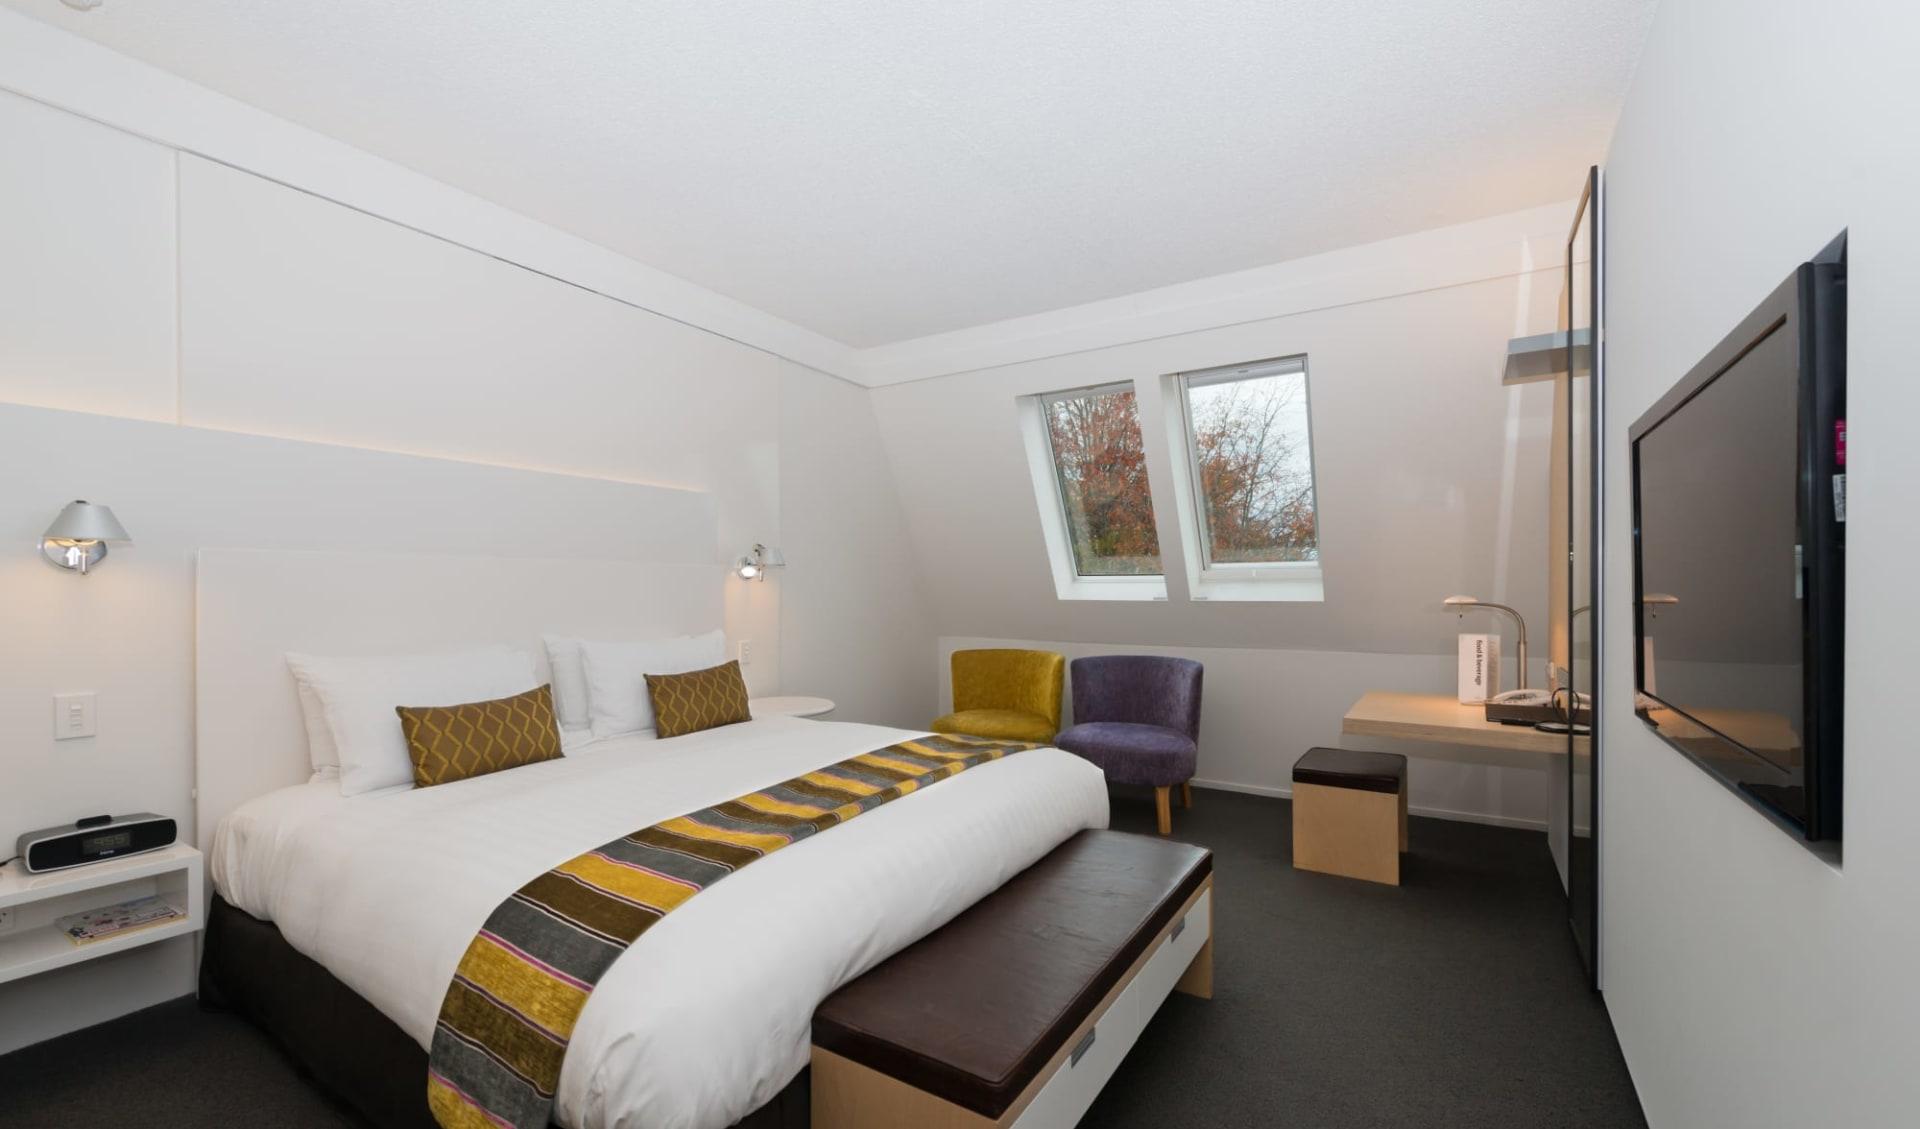 Scenic Hotel Marlborough in Blenheim:  Scenic Hotel Marlborough-32